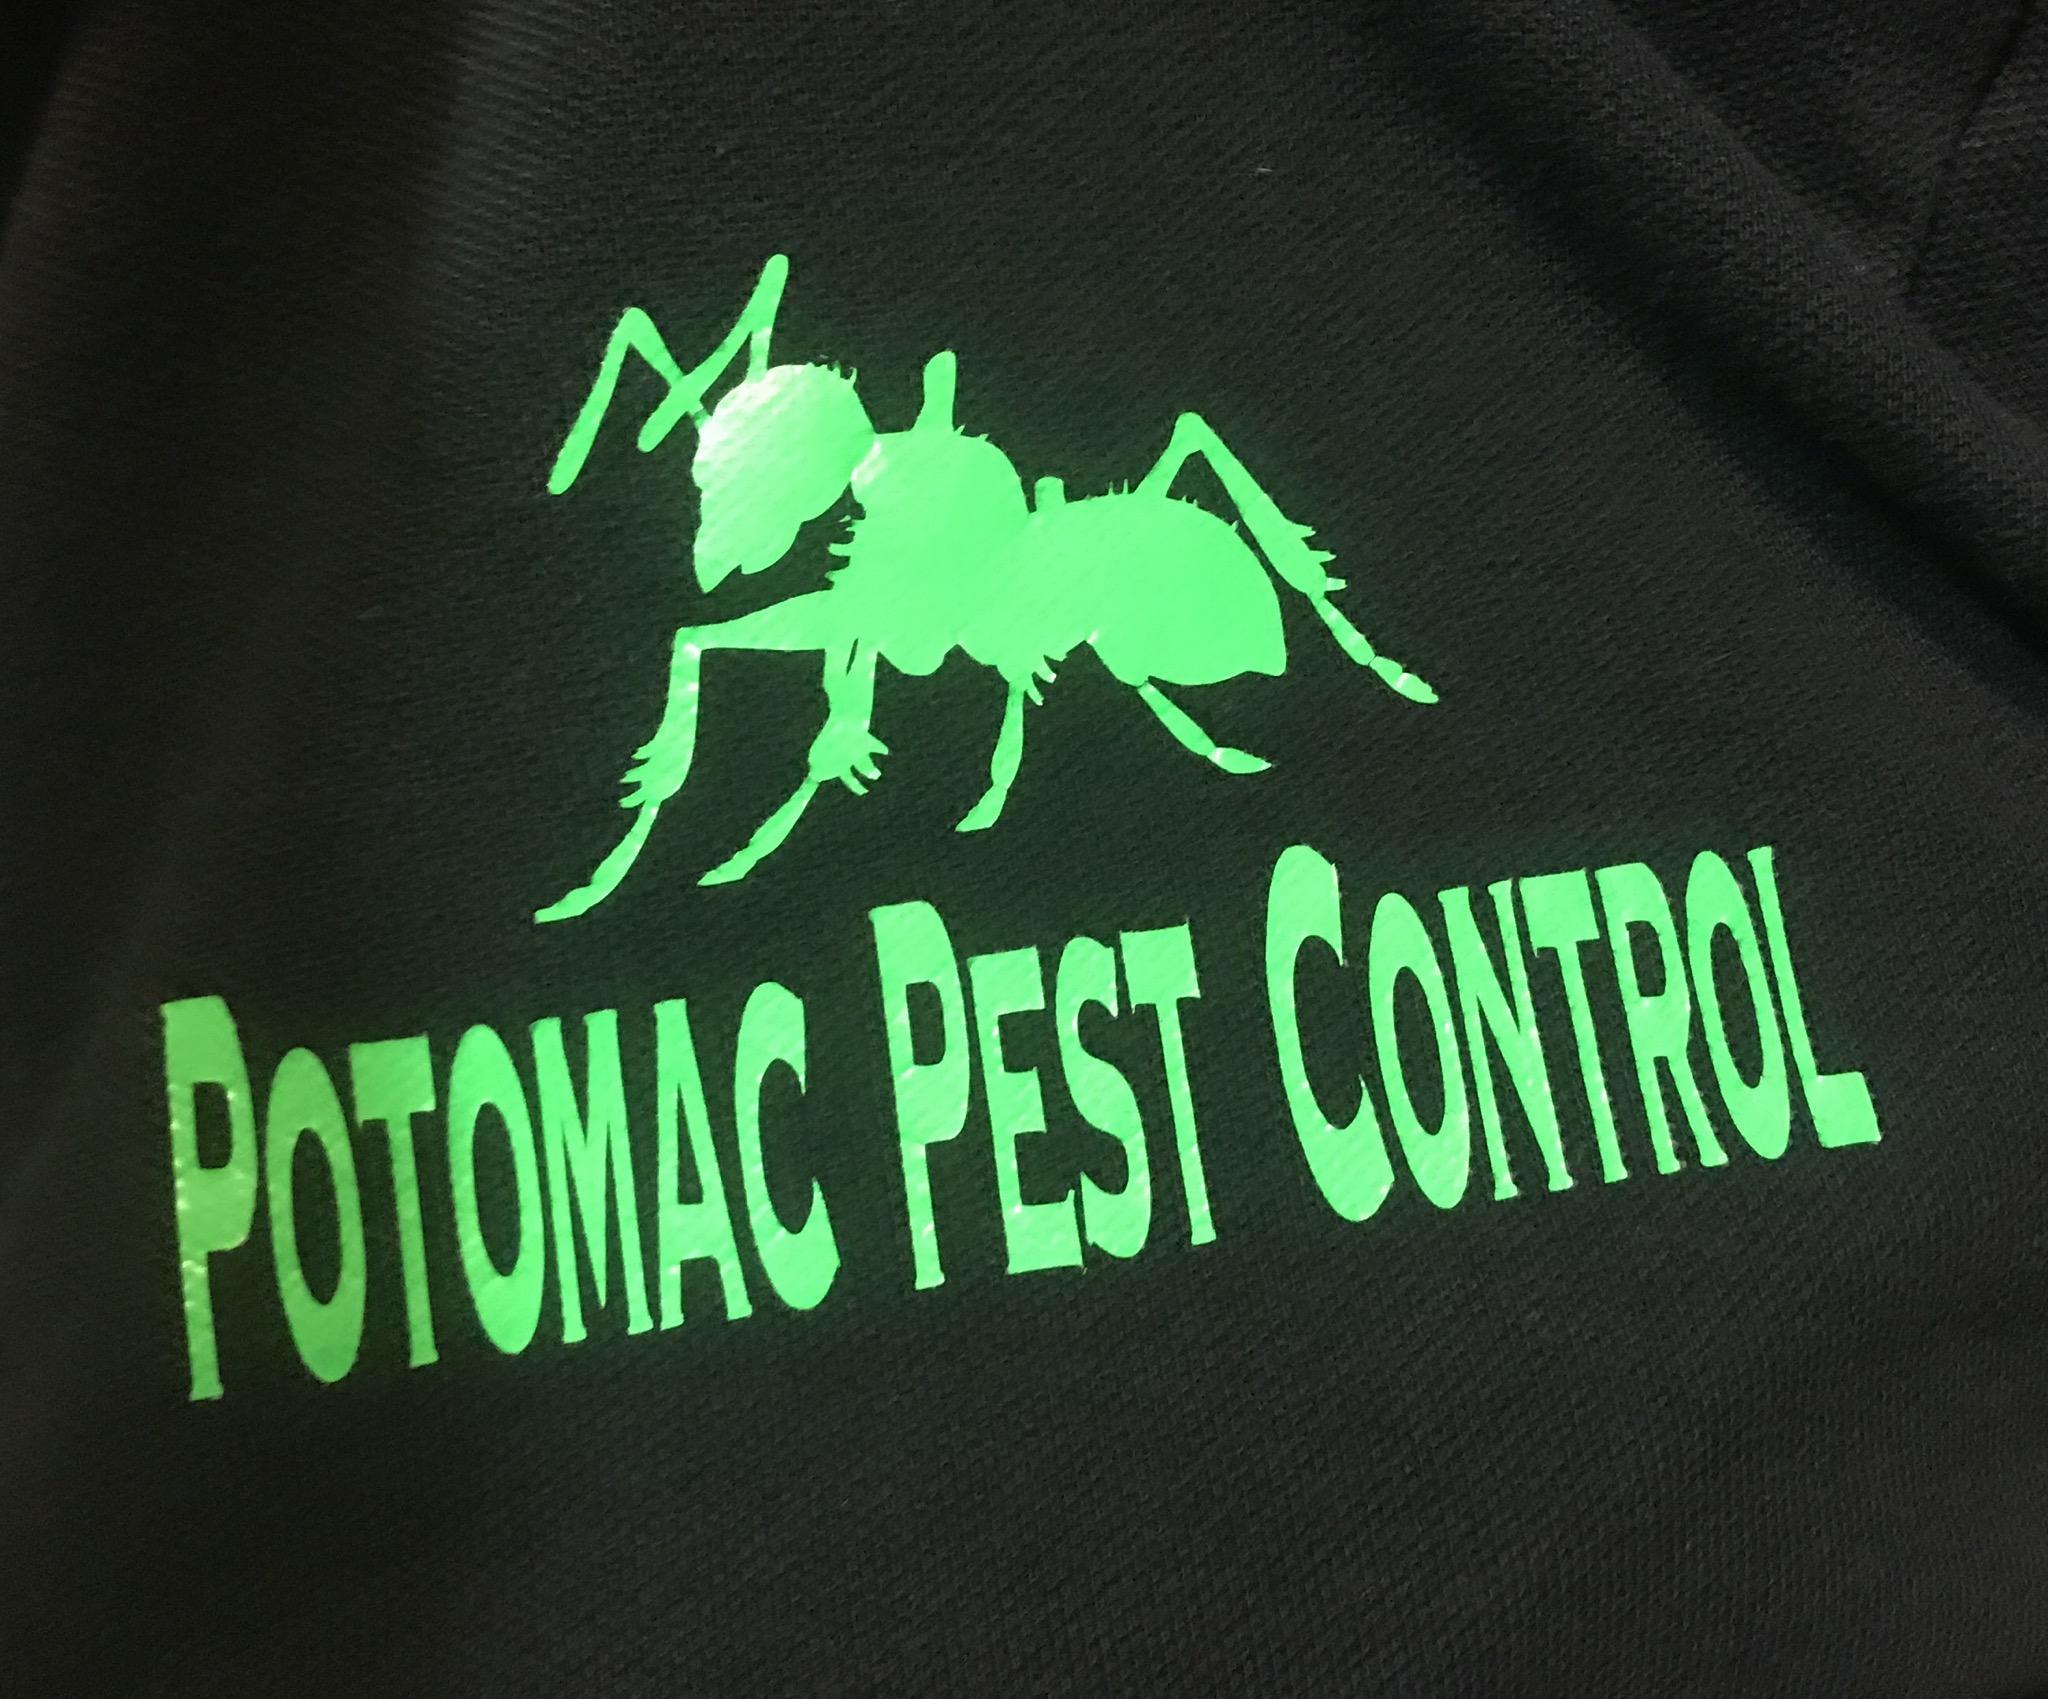 Potomac Pest & Termite Control